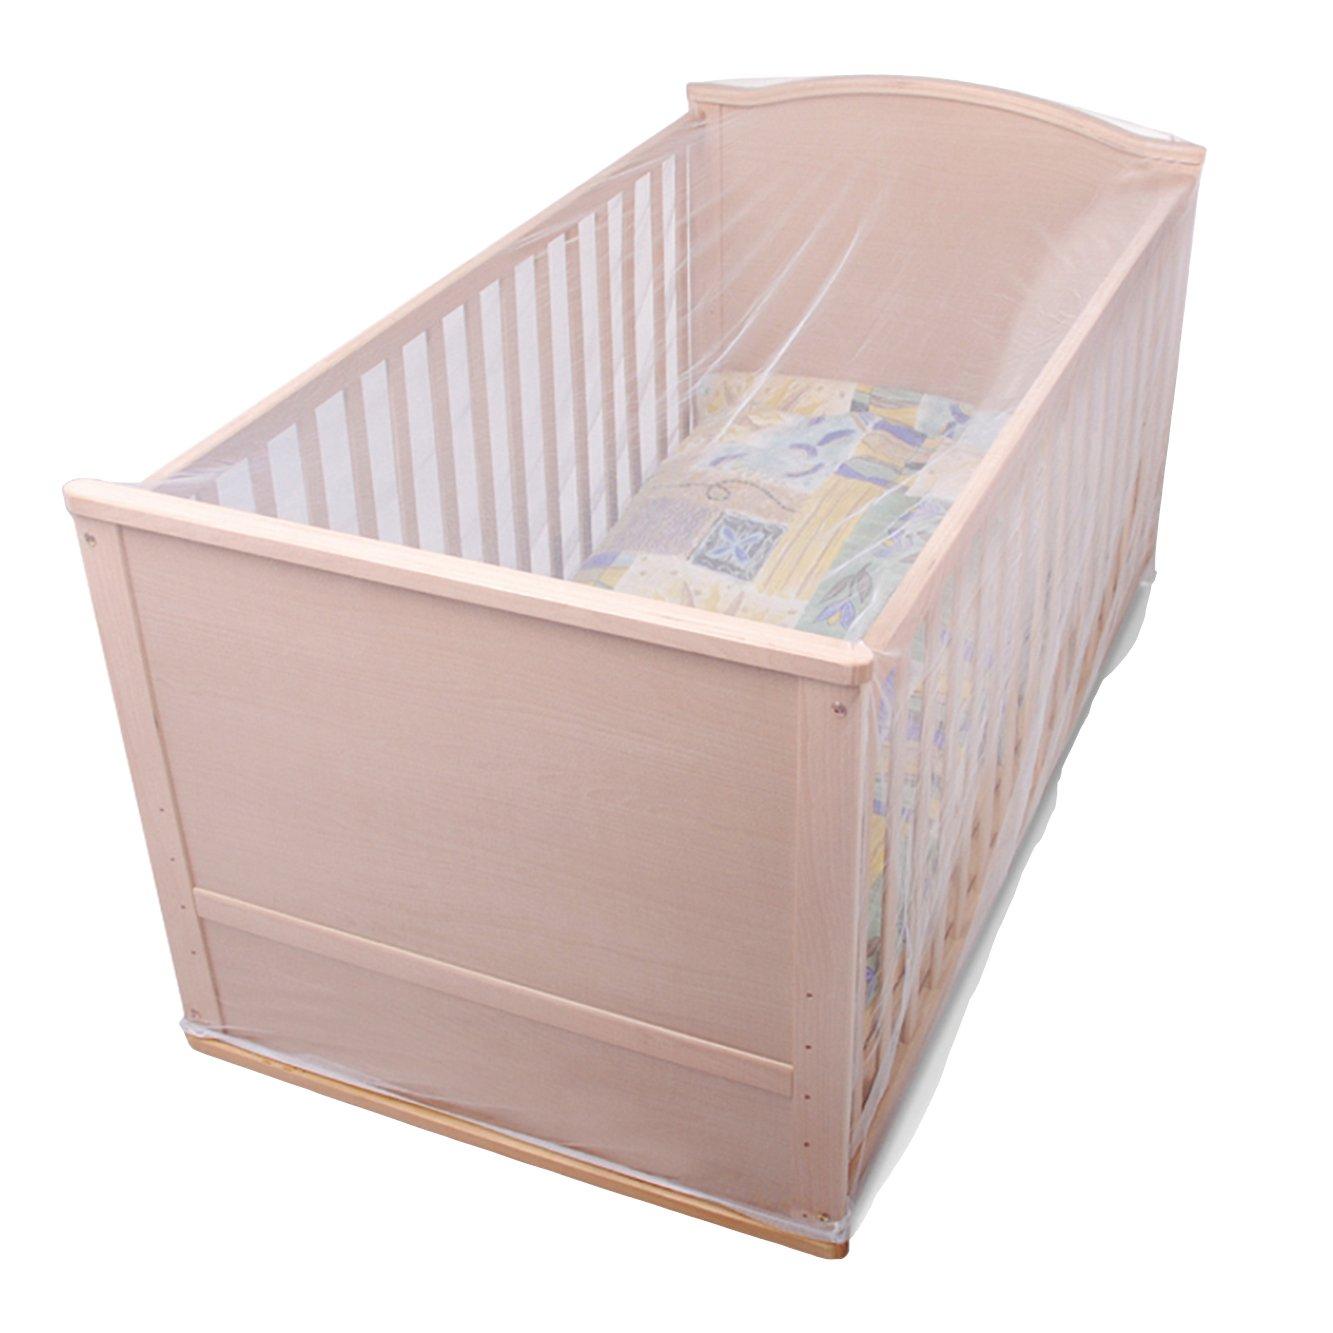 DIAGO Mosquito Net Cot (White) 30012.71558